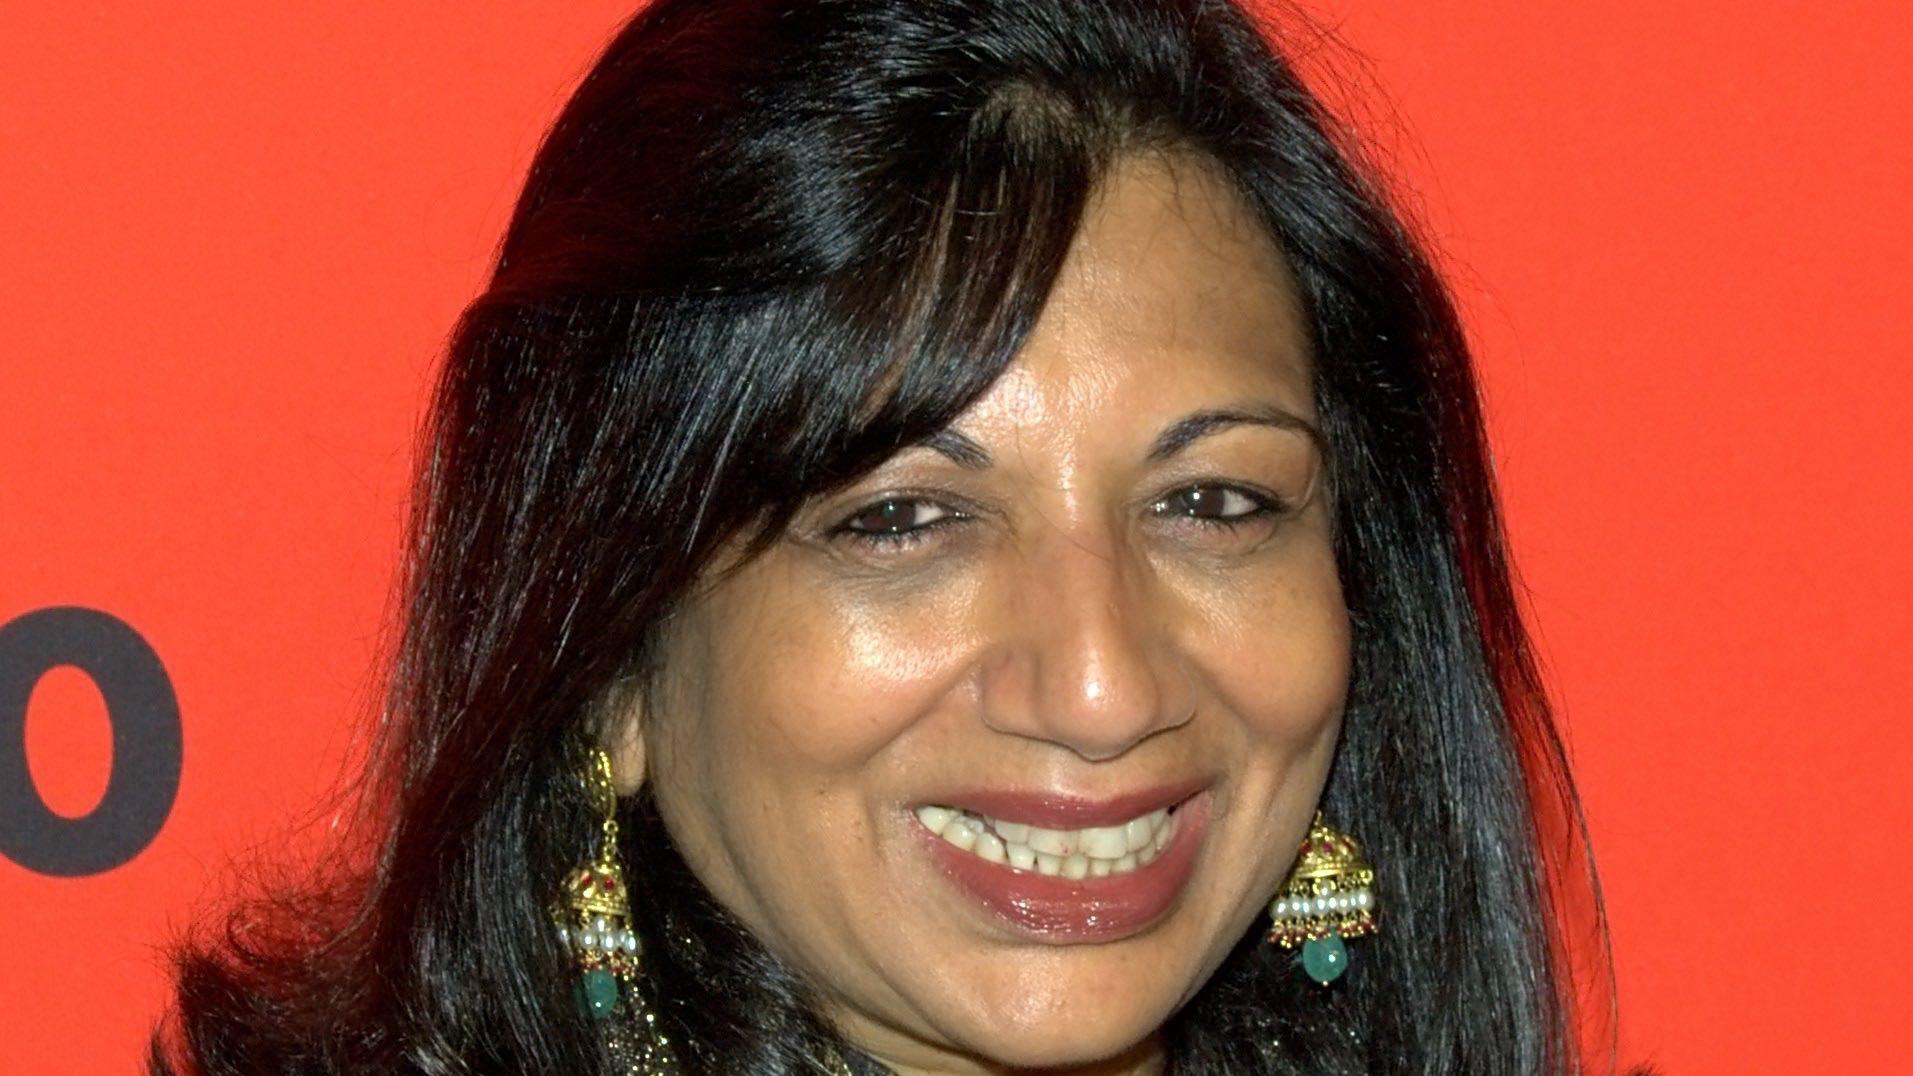 Kiran_Mazumdar-Shaw_David_Shankbone_2010.jpg